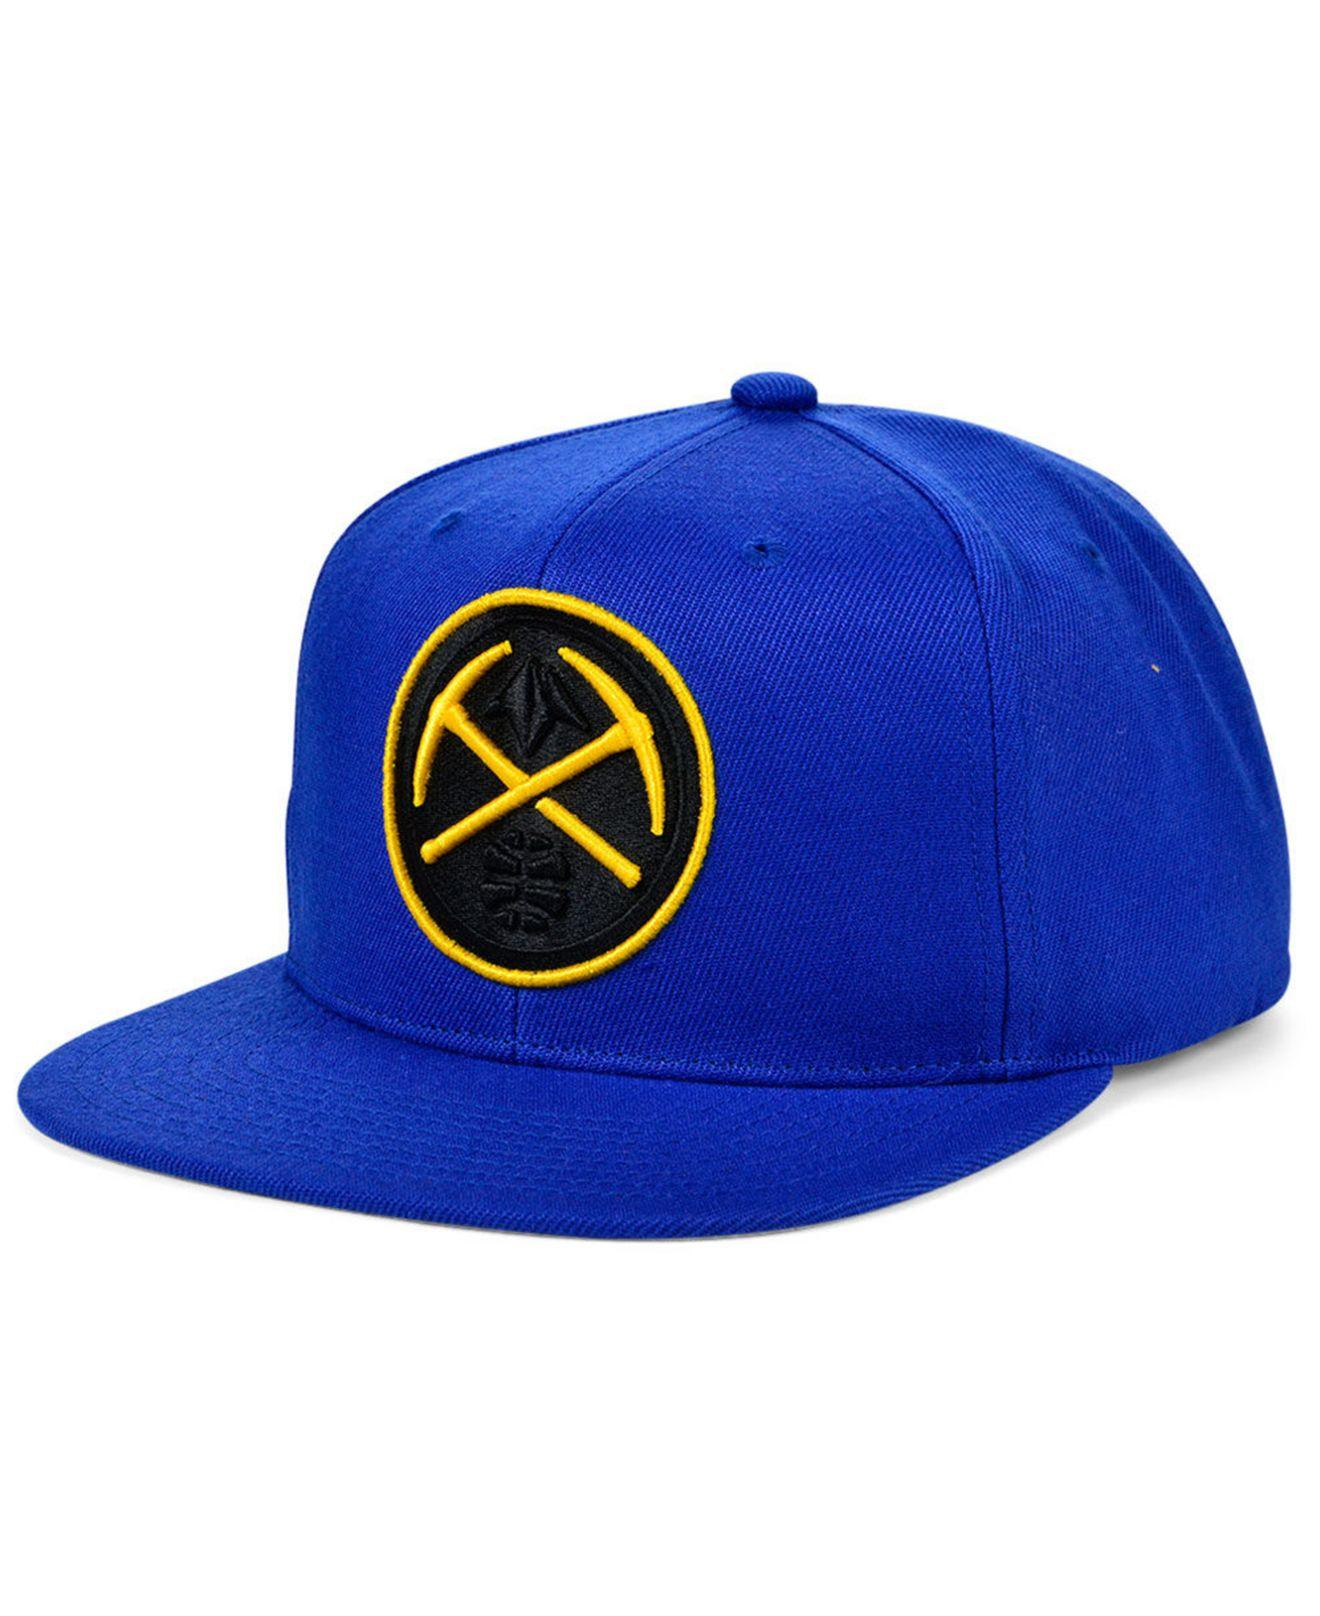 NBA Denver Nuggets Hardwood Classics Embroidered Logo Snapback Cap Hat Mens